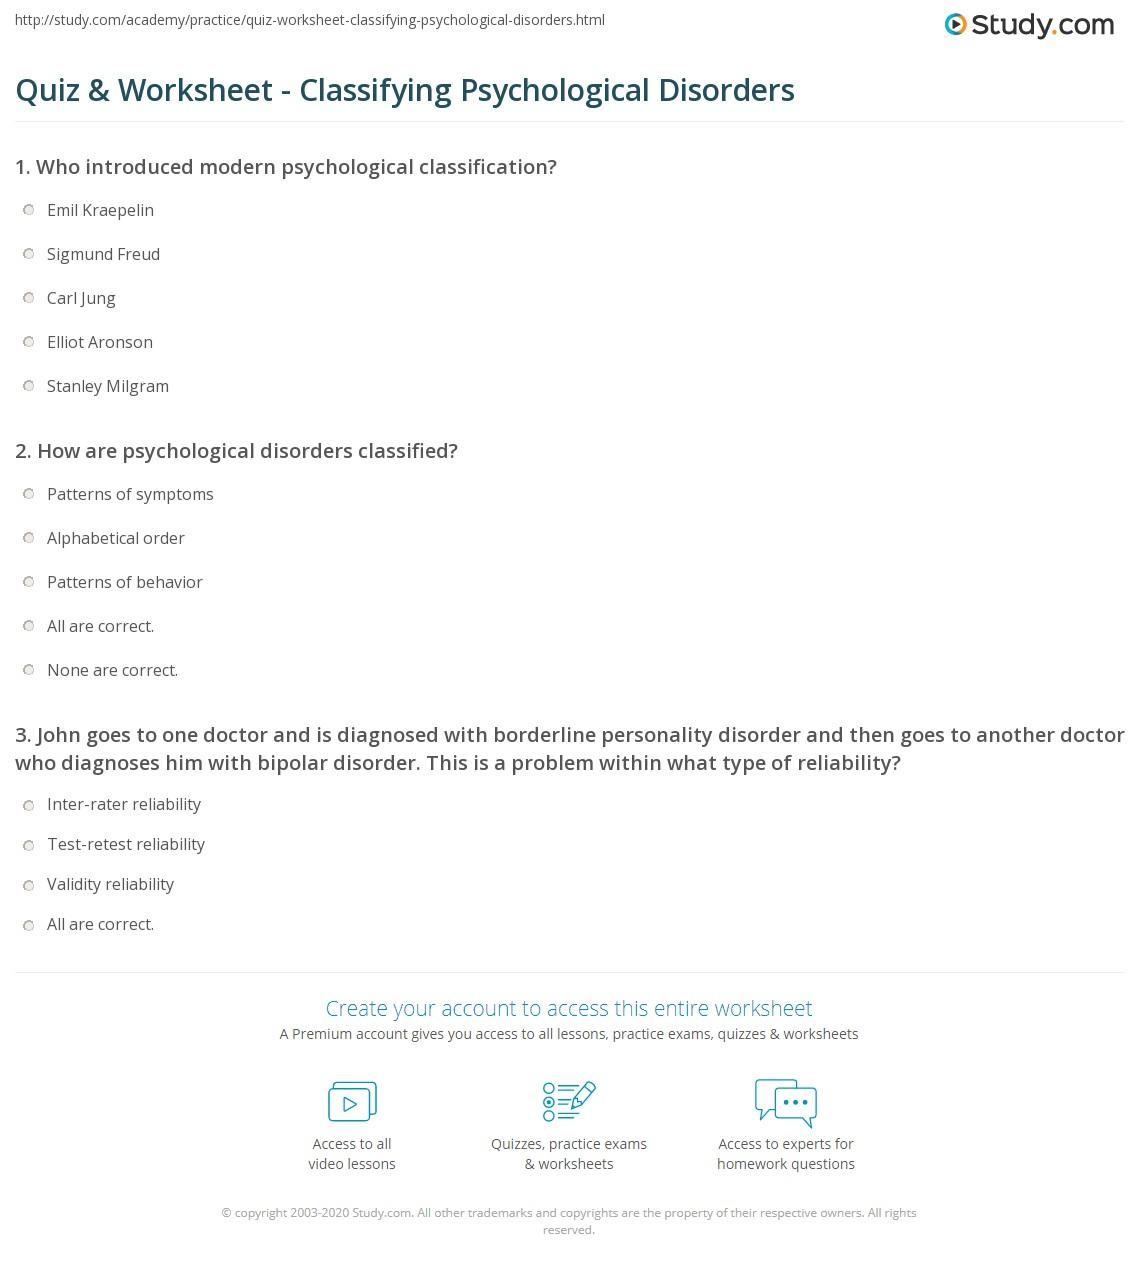 Quiz Worksheet Classifying Psychological Disorders Study Com